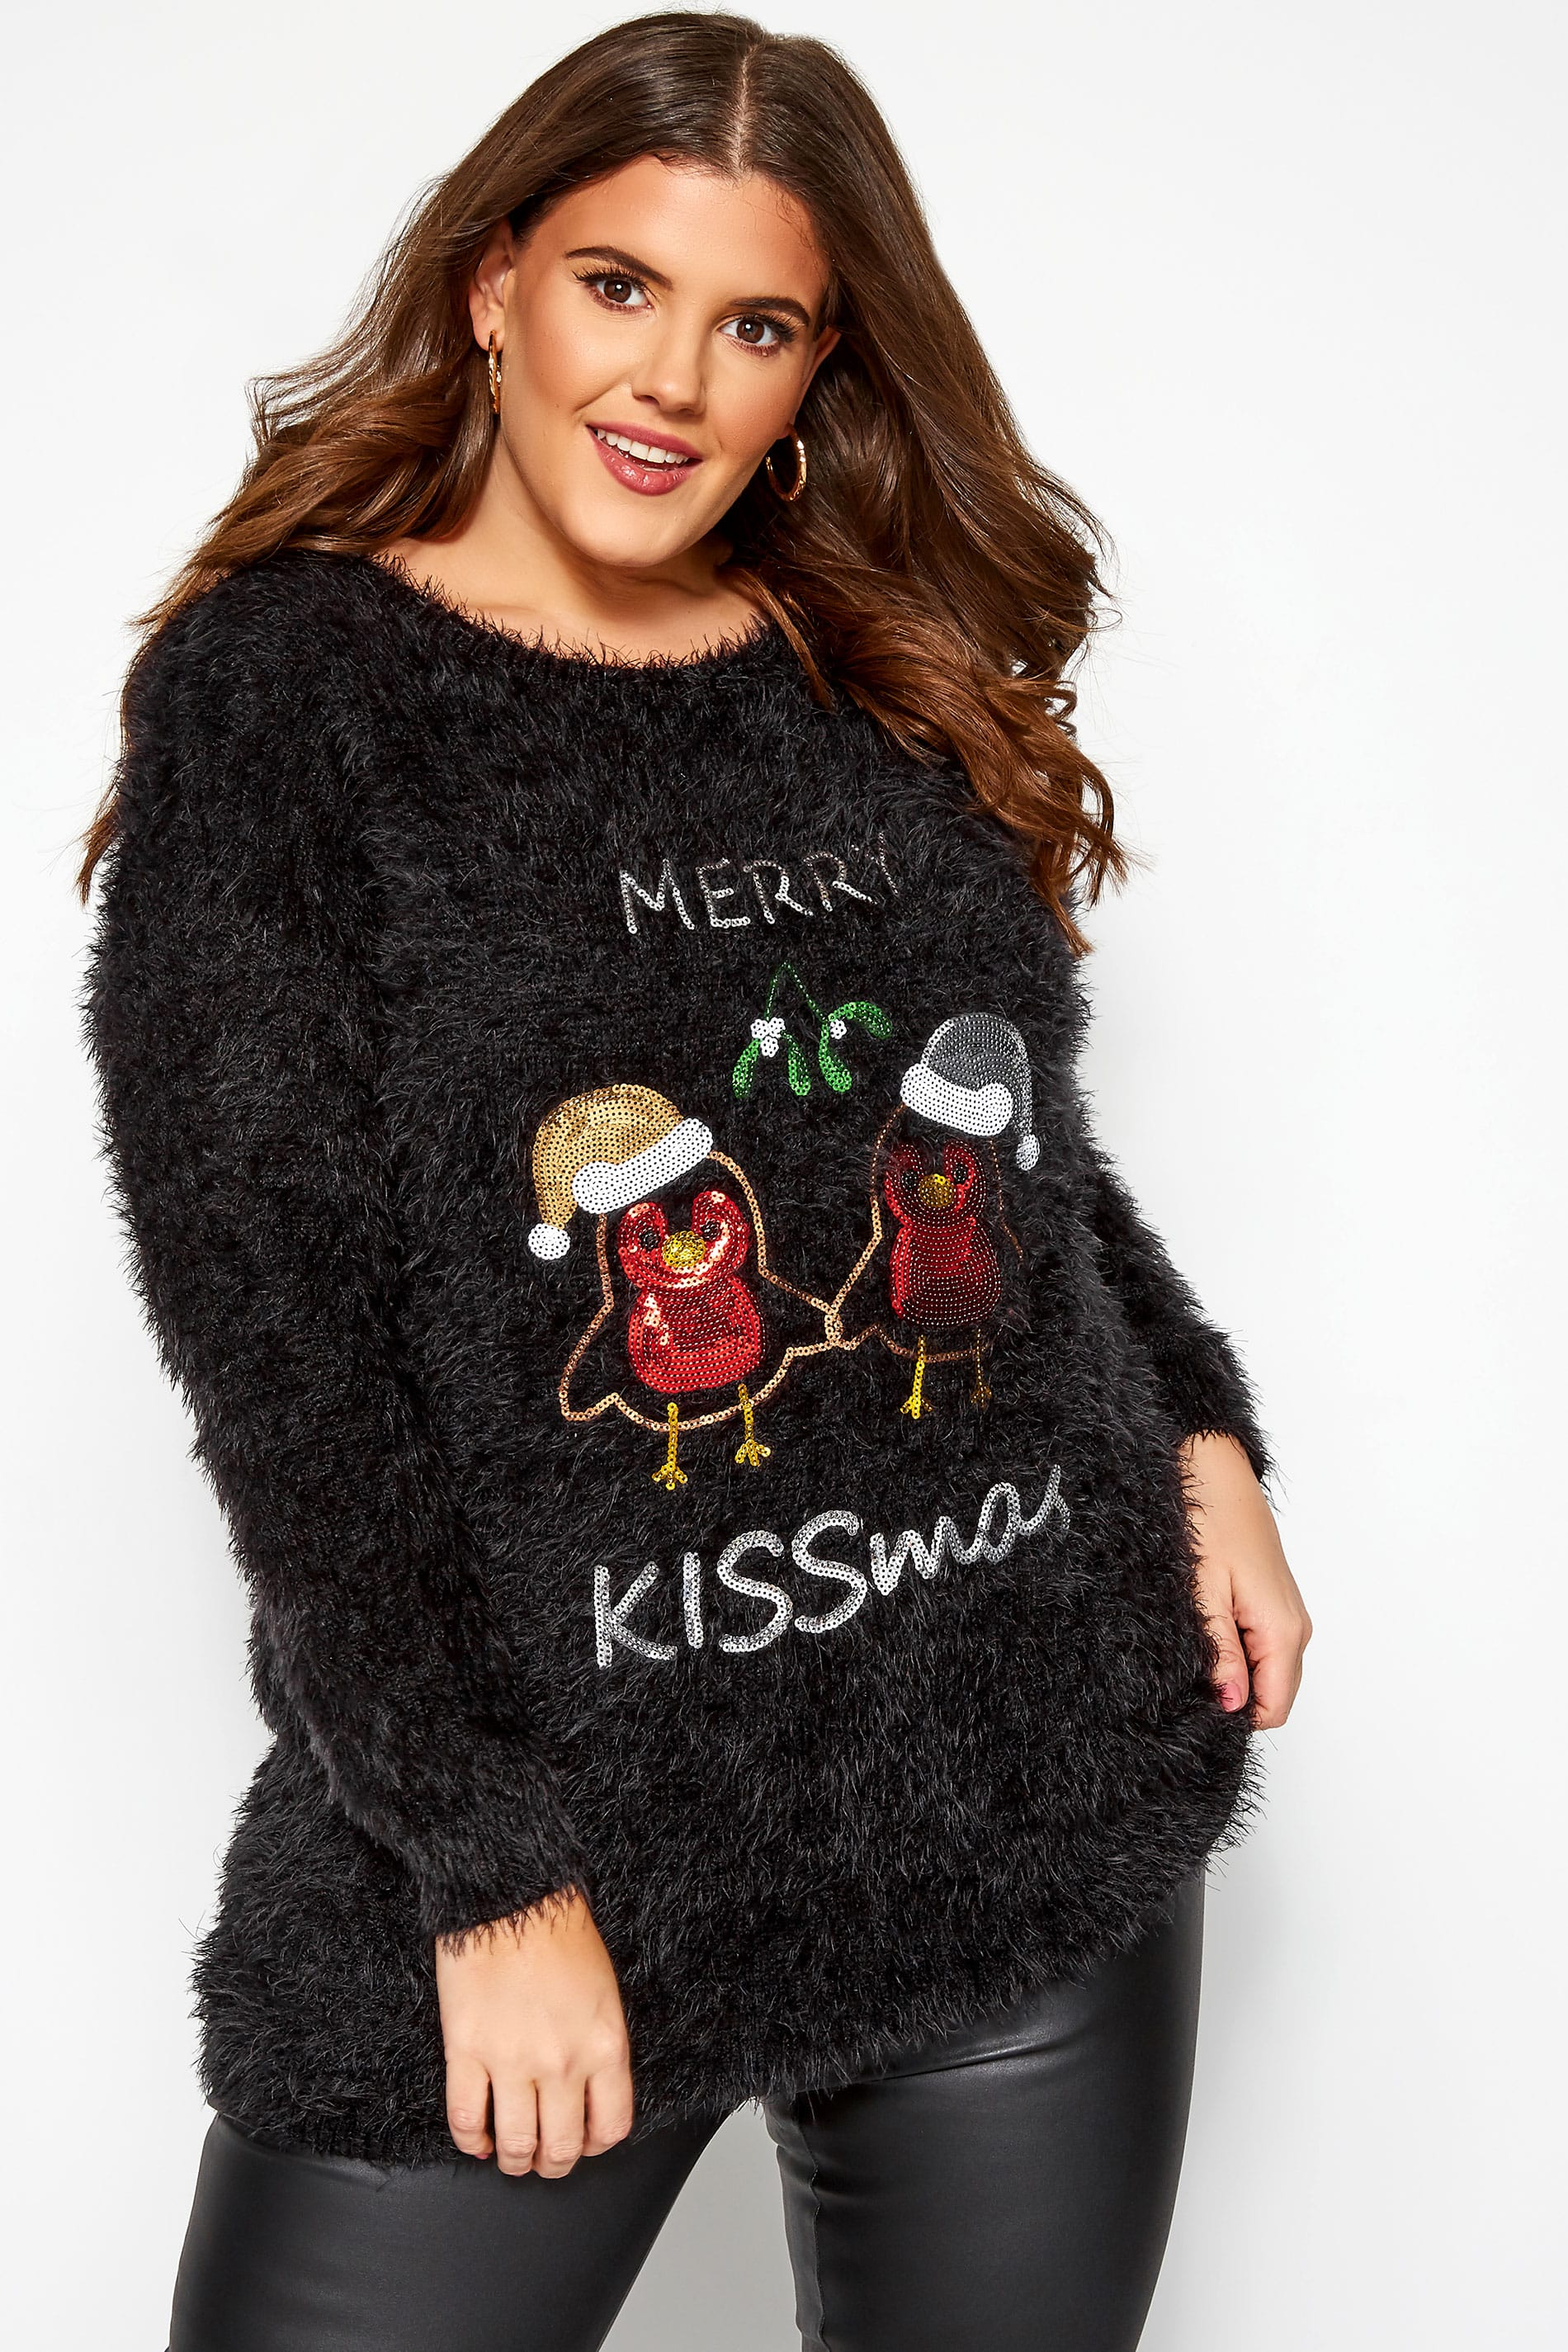 Black Sequin 'Merry Kissmas' Christmas Jumper